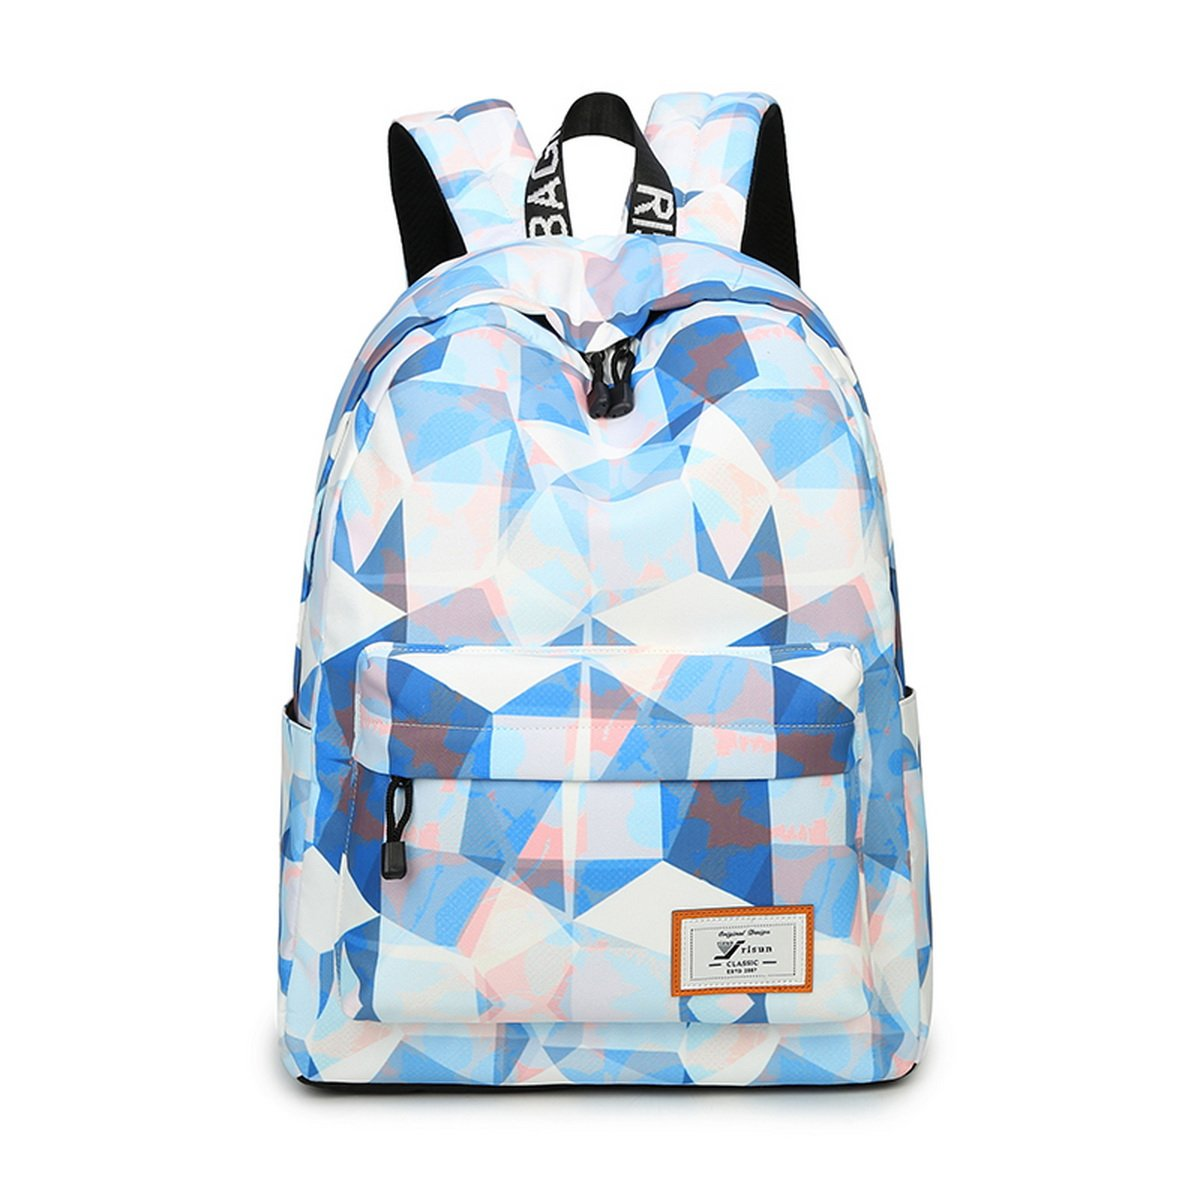 46d450b2ecf Joymoze Fashion Leisure Backpack for Girls Teenage School Backpack Women  Print Backpack Purse Blue and White